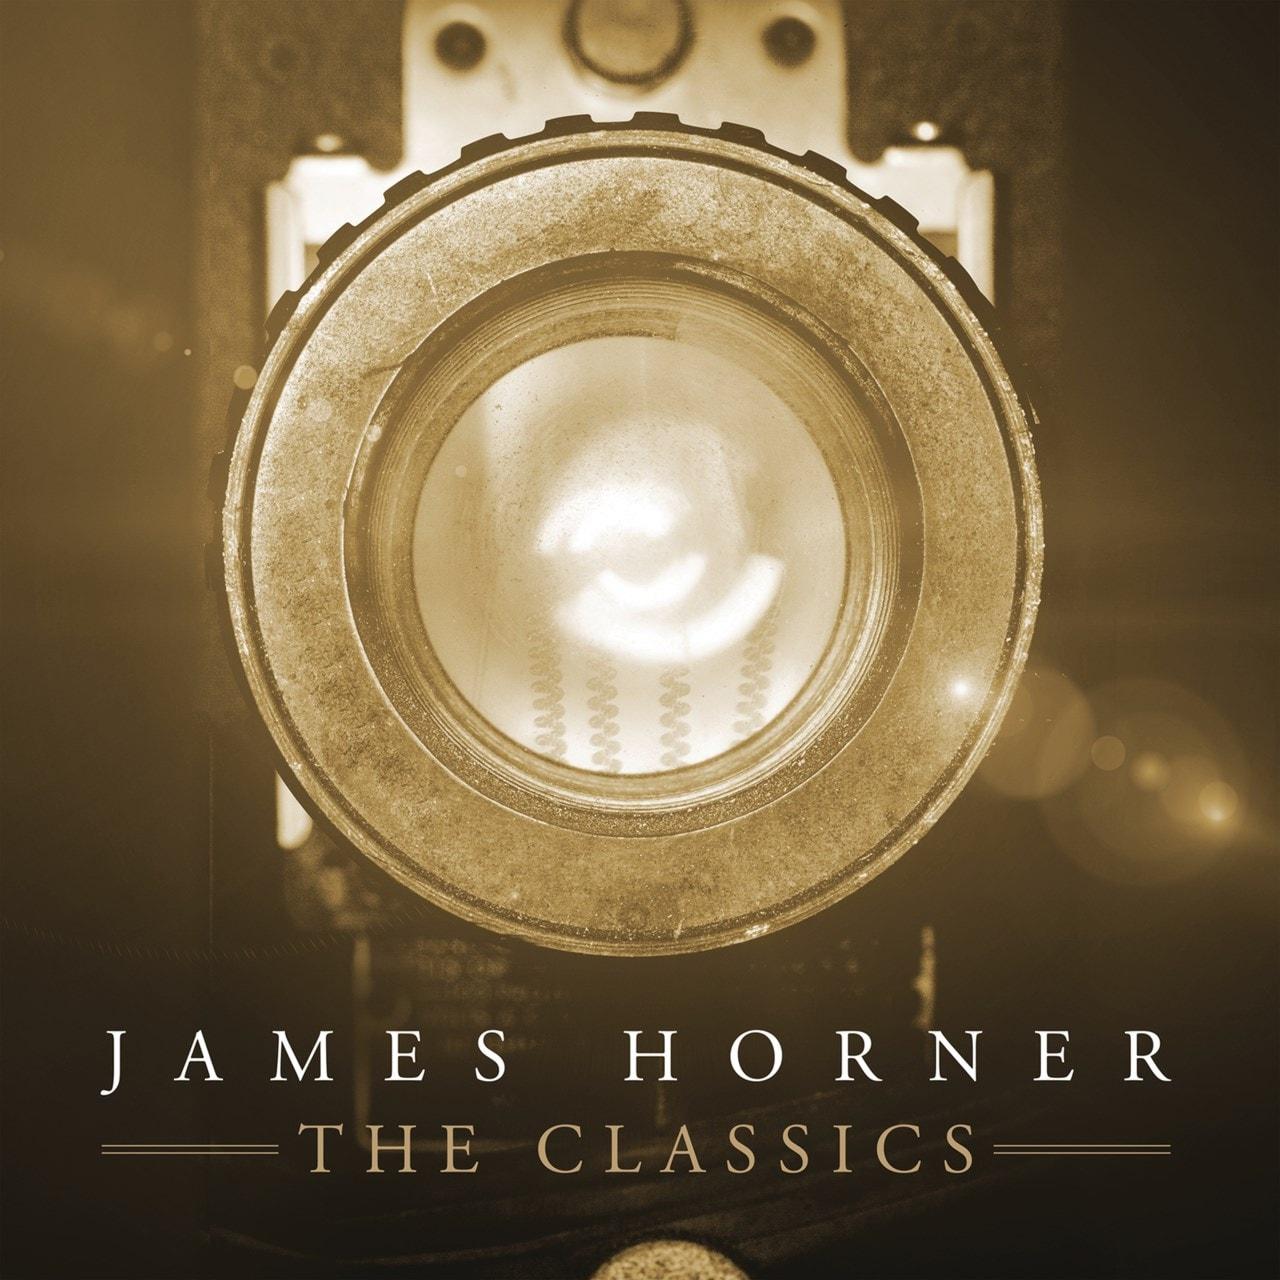 James Horner: The Classics - 1